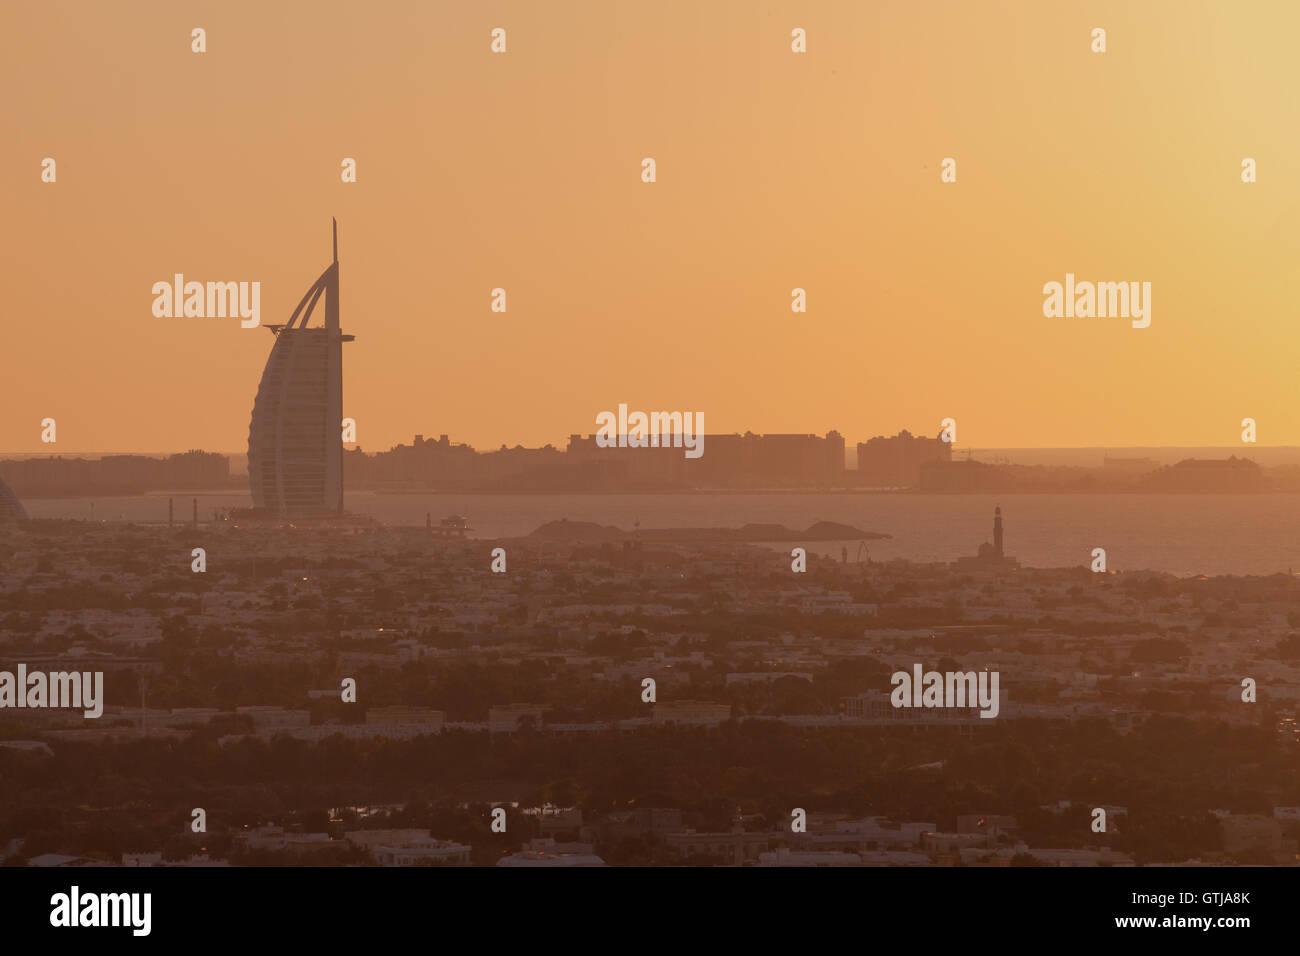 Burj Al Arab the luxury 7 stars hotel and jumeirah beach in panoramic orange silhouette sunset - Stock Image